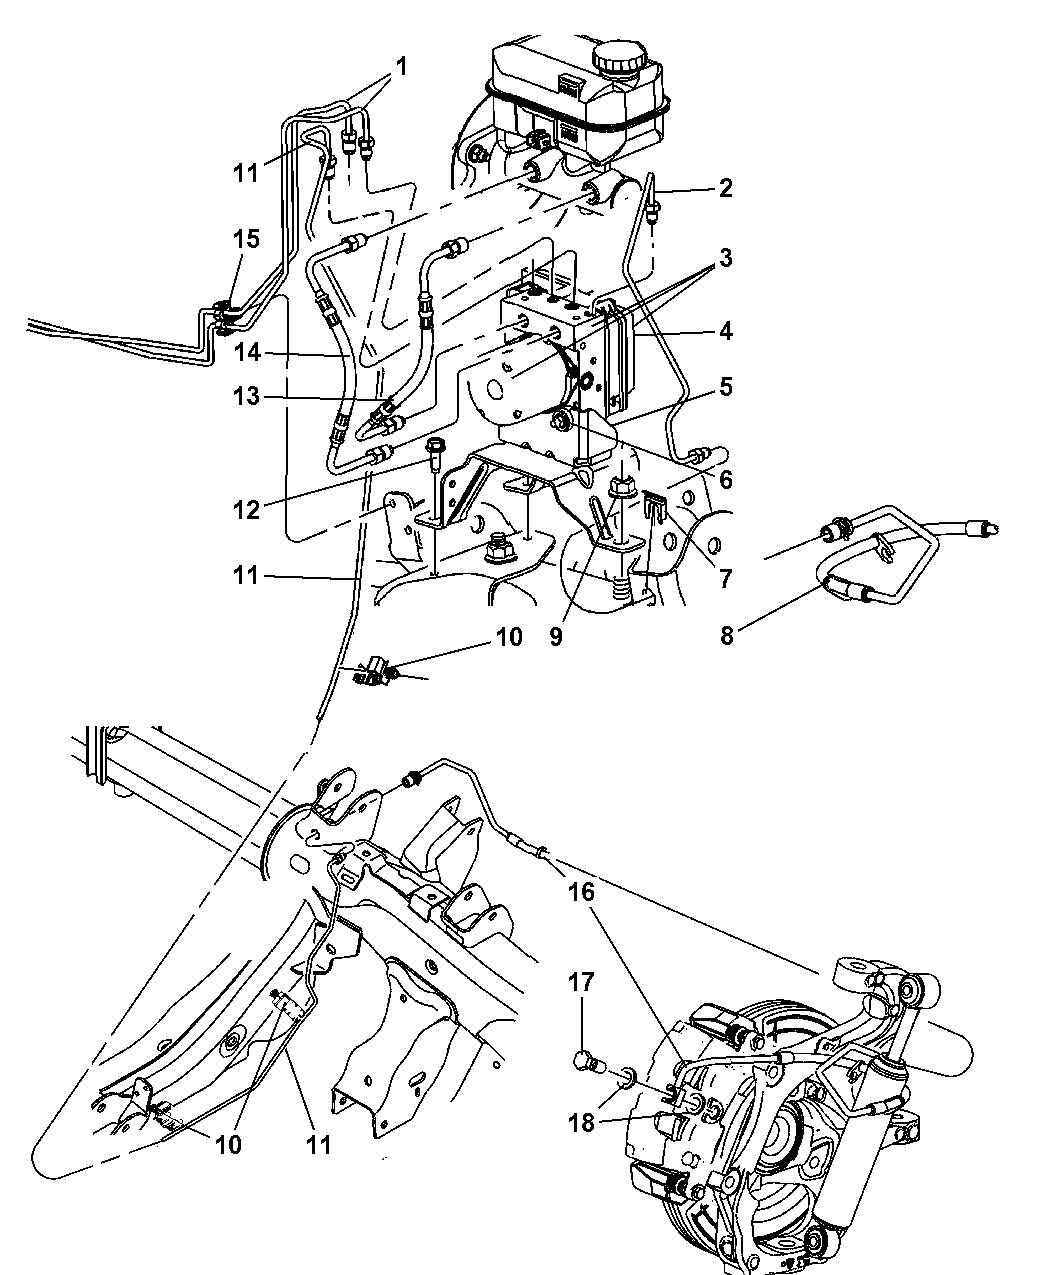 Vacuum Lines Diagram Along With 2001 Ford Ranger Vacuum Hose Diagram